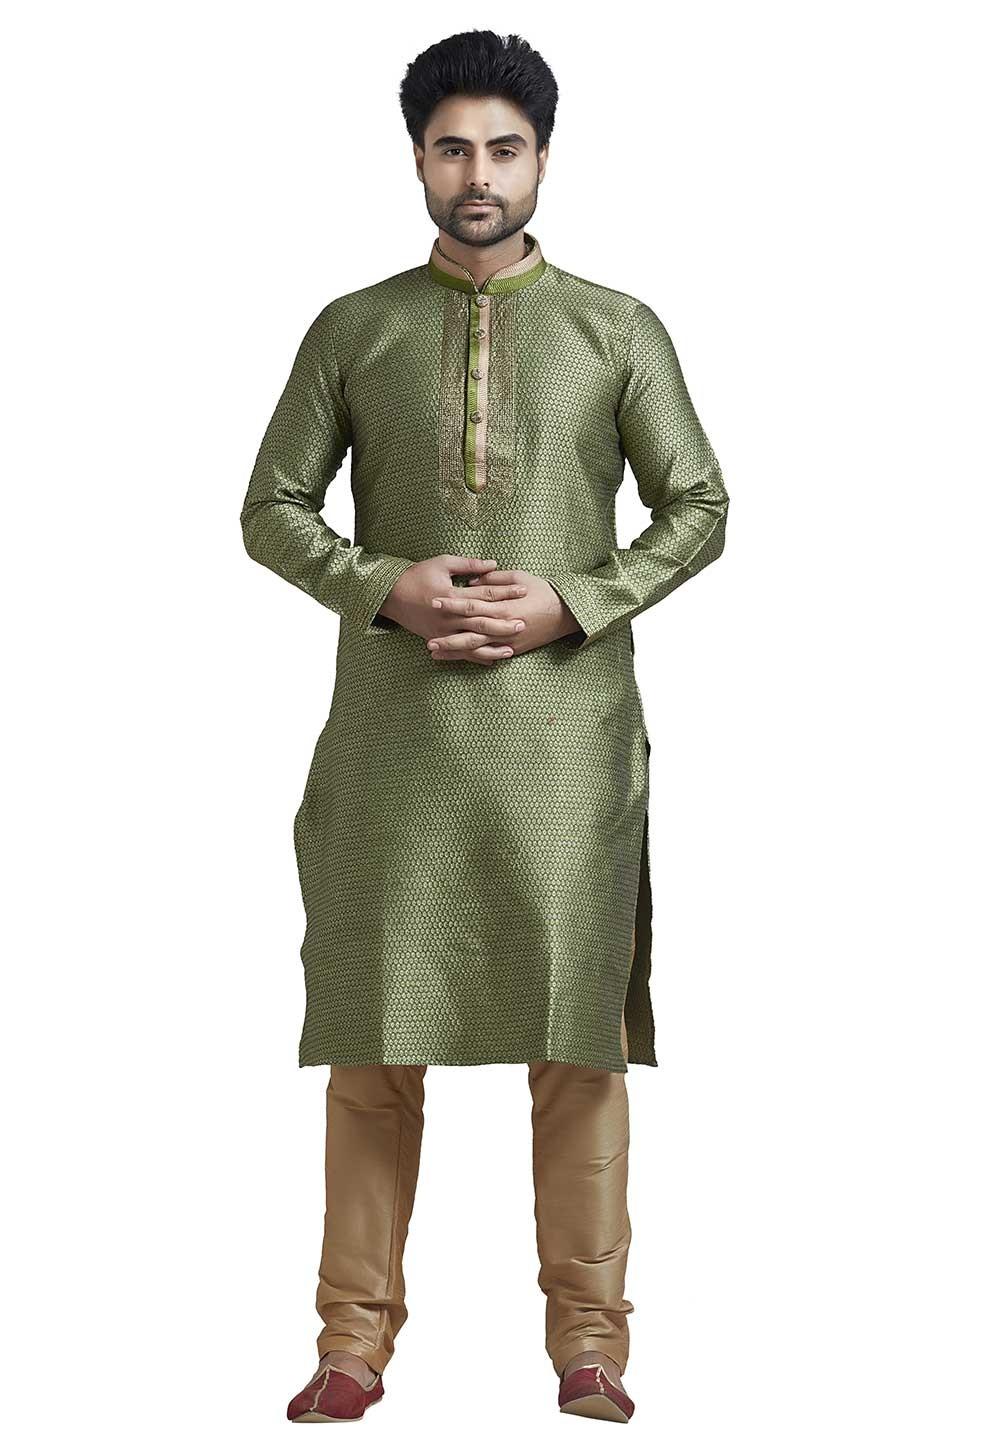 Readymade: Buy Kurta Pyjama Online in Green Colour